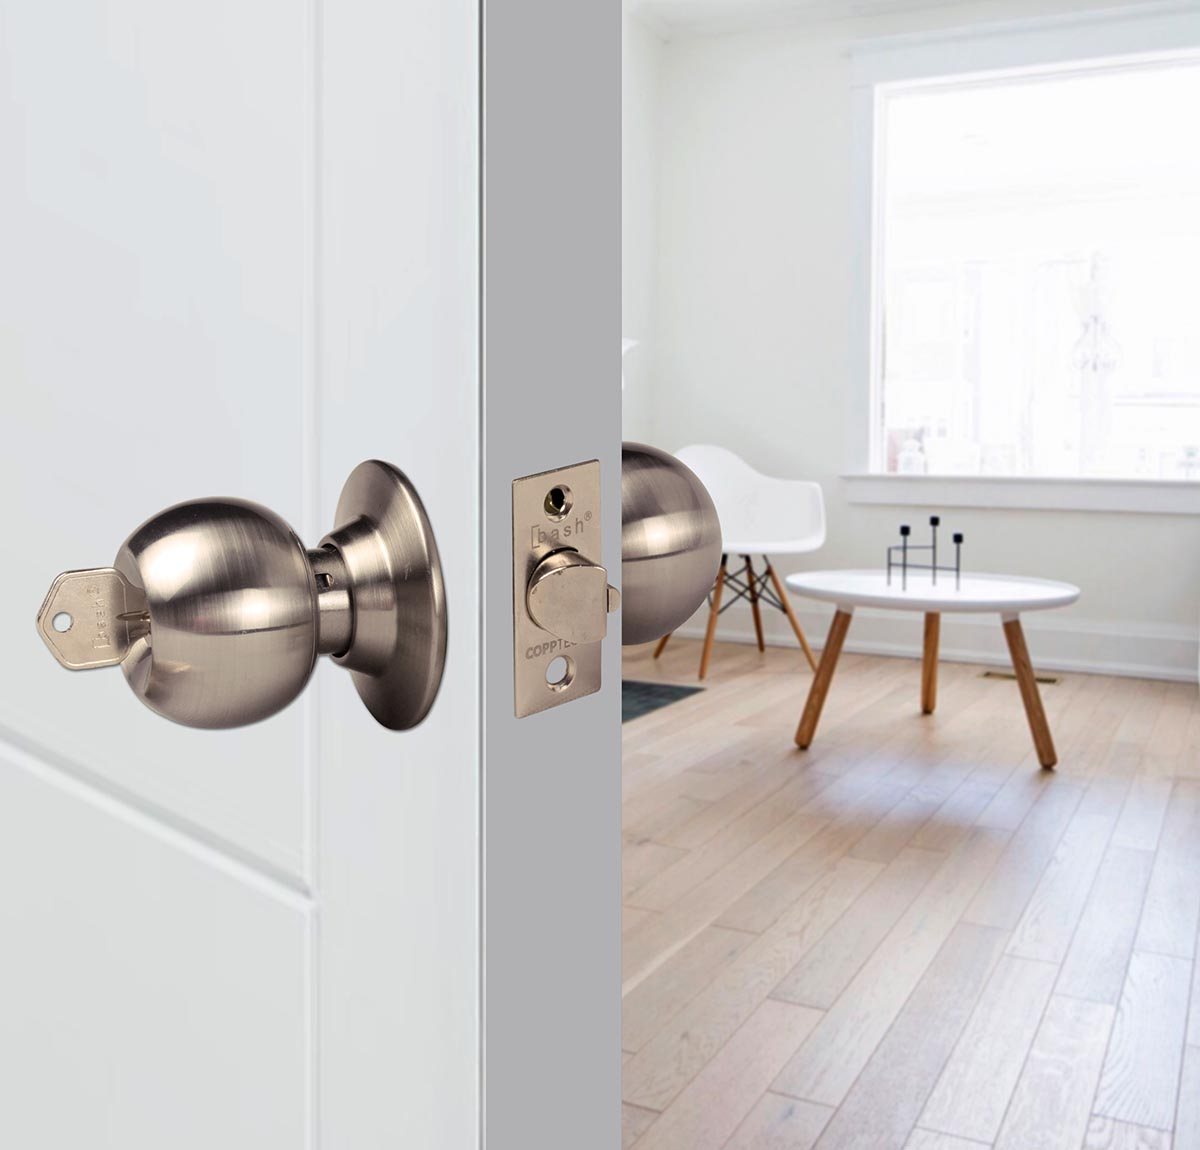 cerradura-bash-puerta (1)